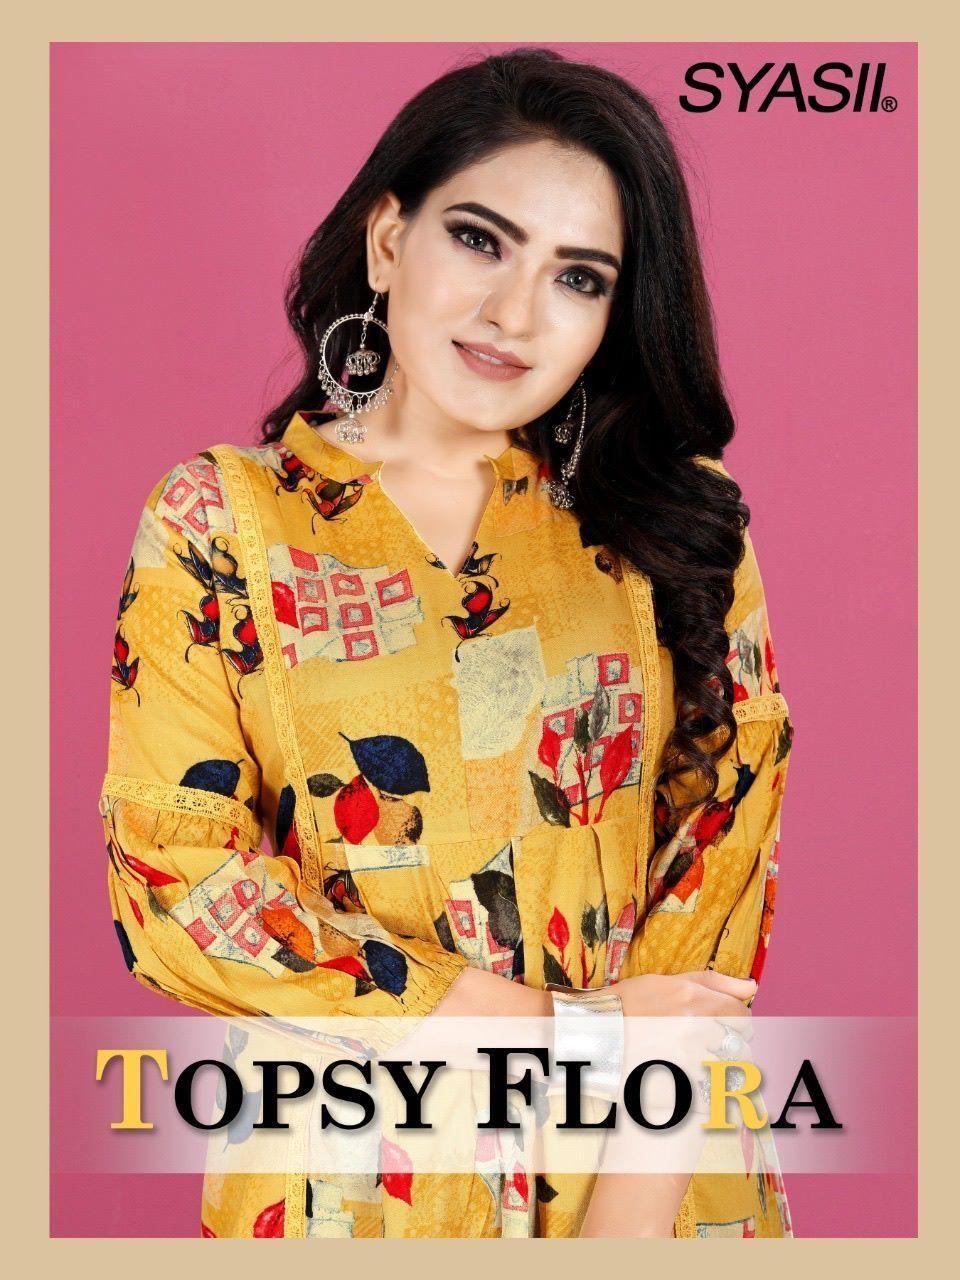 Syasii-Topsy-Flora-1